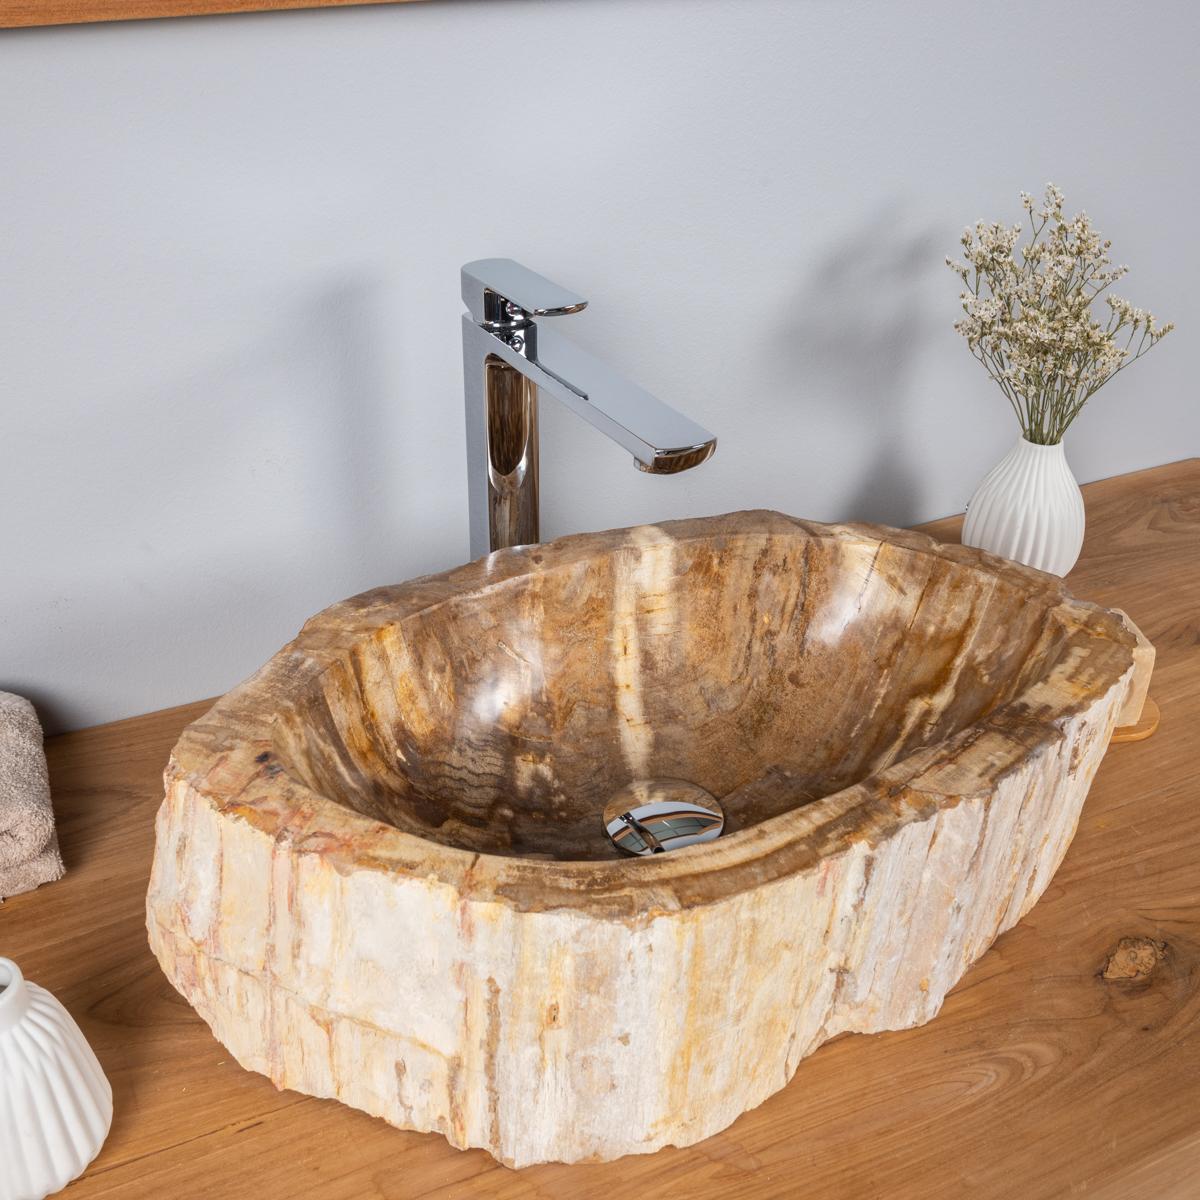 Vasque salle de bain en bois fossilis p trifi poser 53 cm - Vasque salle de bain bois ...